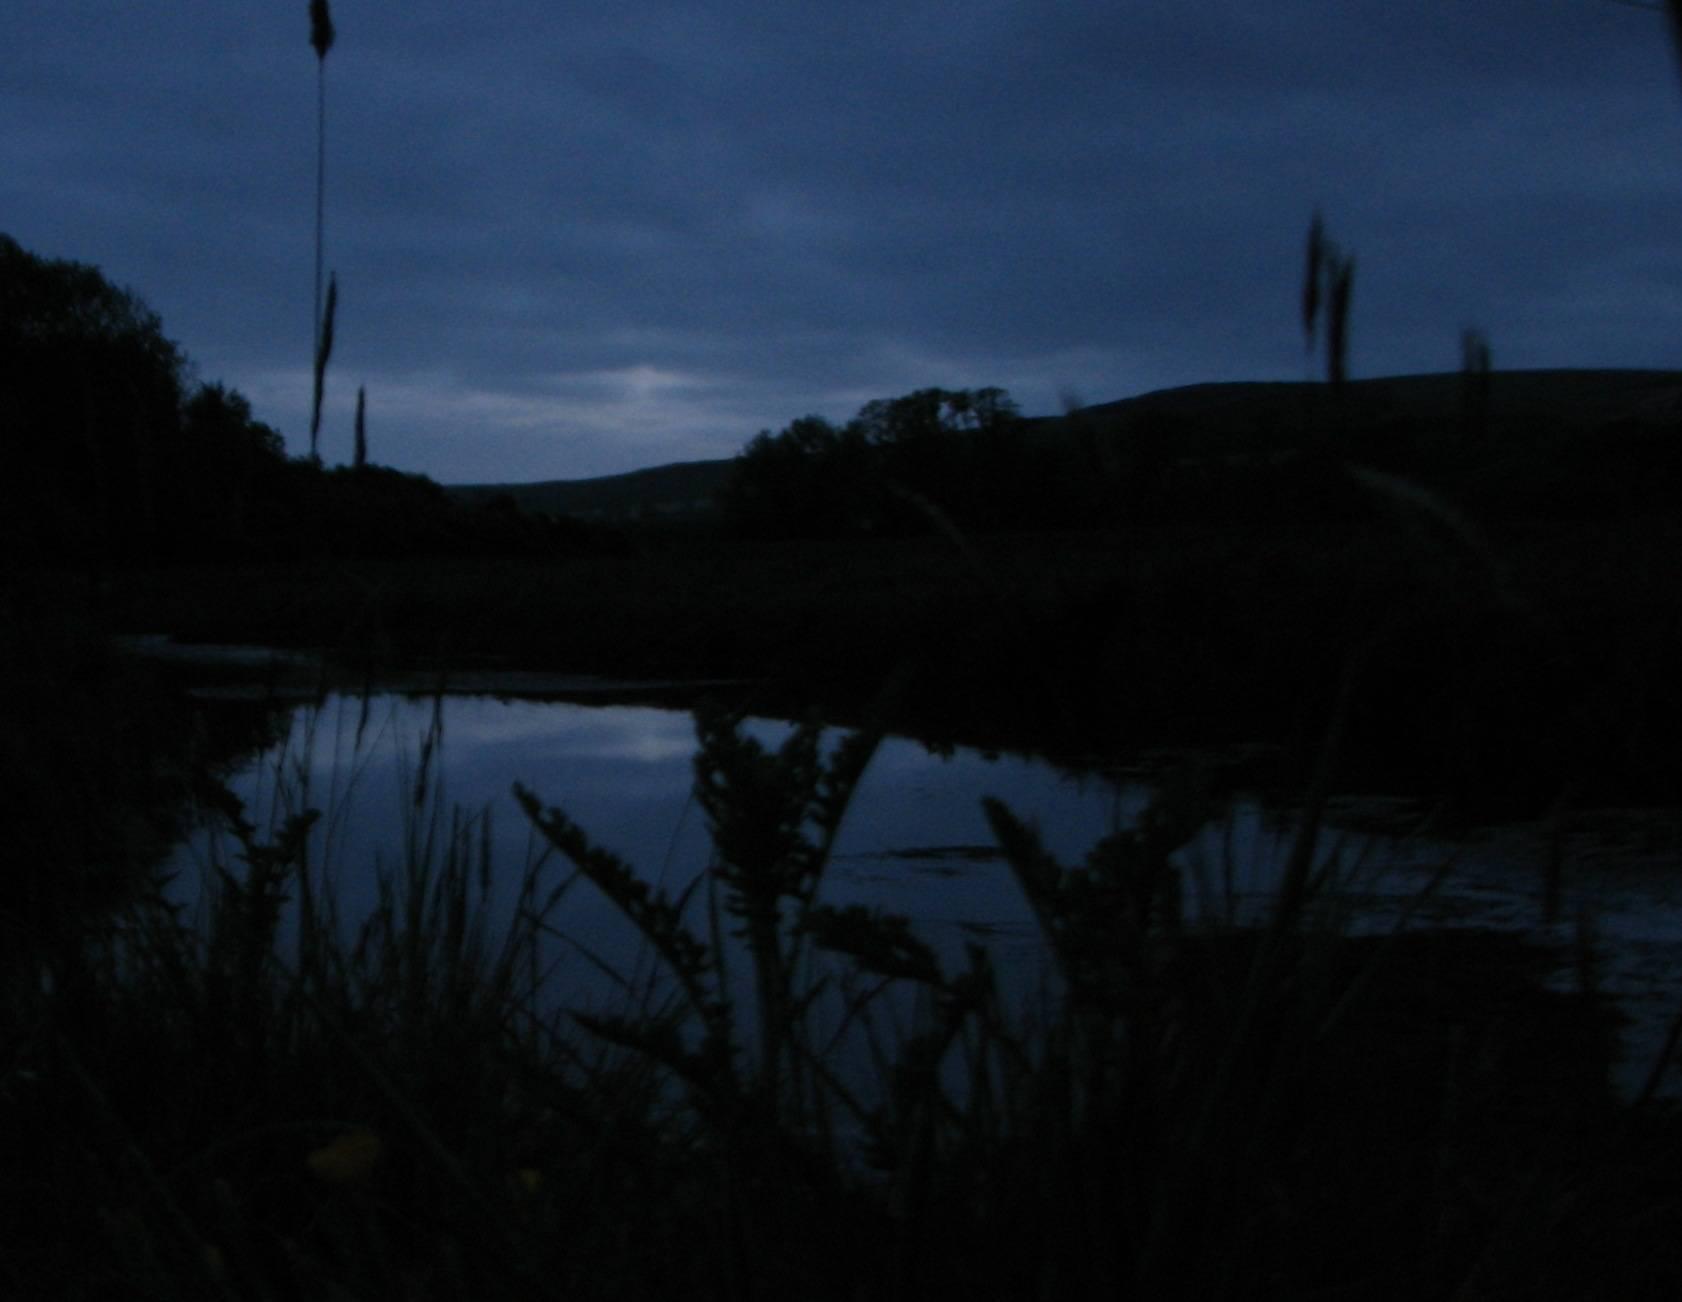 Bowmont water at dusk